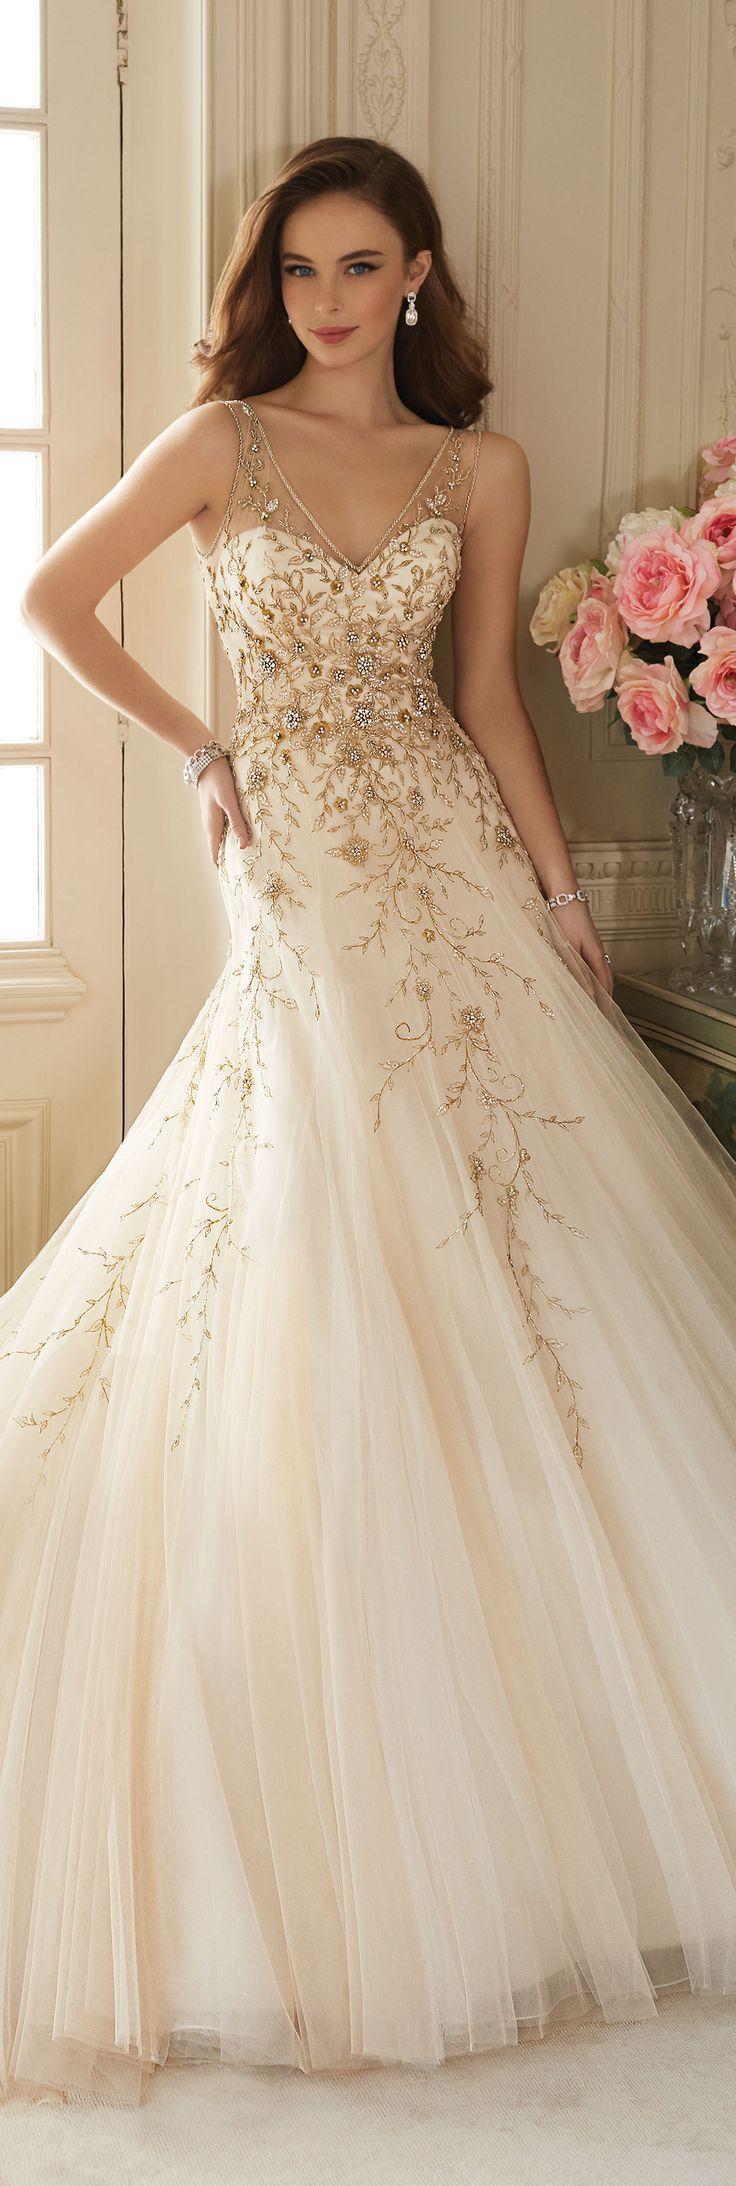 Wedding Dresses by Sophia Tolli - Spring 2016  Collection - Style No. Y11650 - Darice #tulleweddingdress